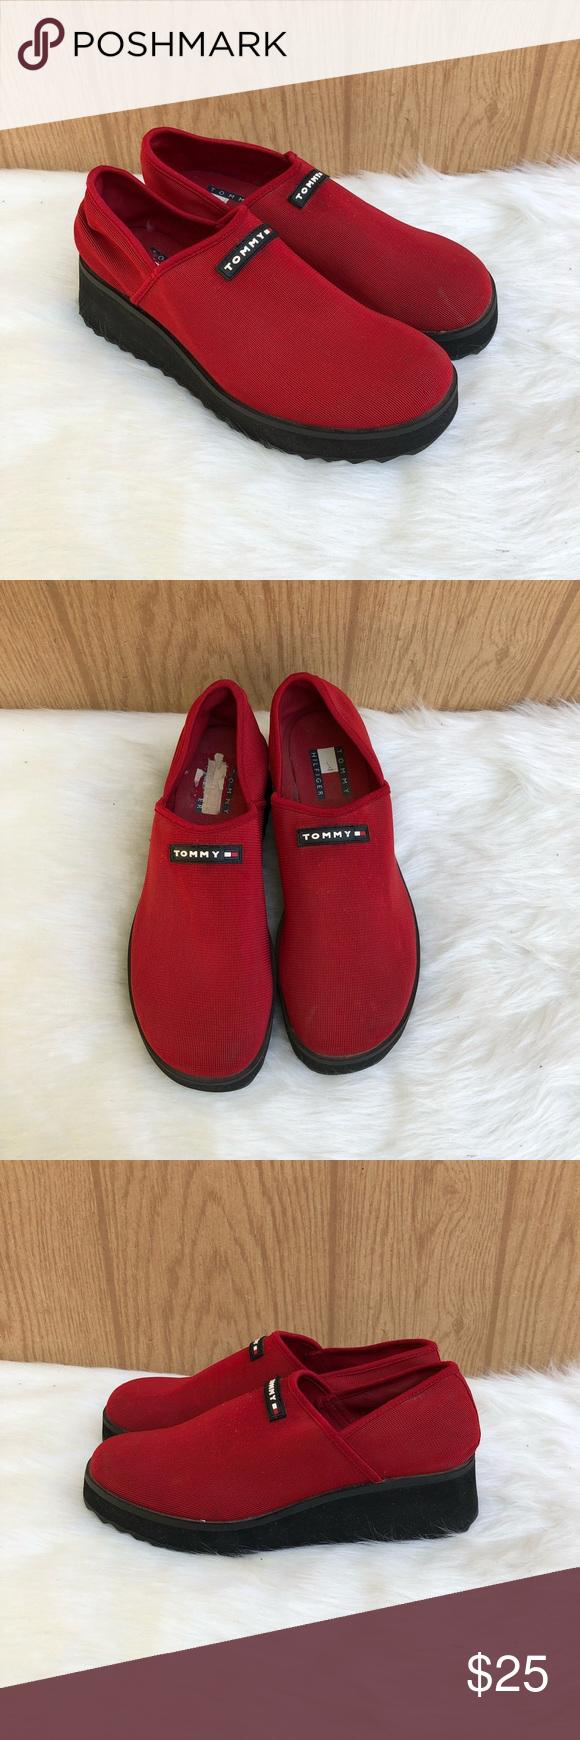 "bfb7bef50b1f23 90 s Tommy Hilfiger platform shoe Red stretch canvas on a black rubber platform  90 s Vintage tommy spell out logo Size 8 1.5"" heel at highest point Tommy  ..."